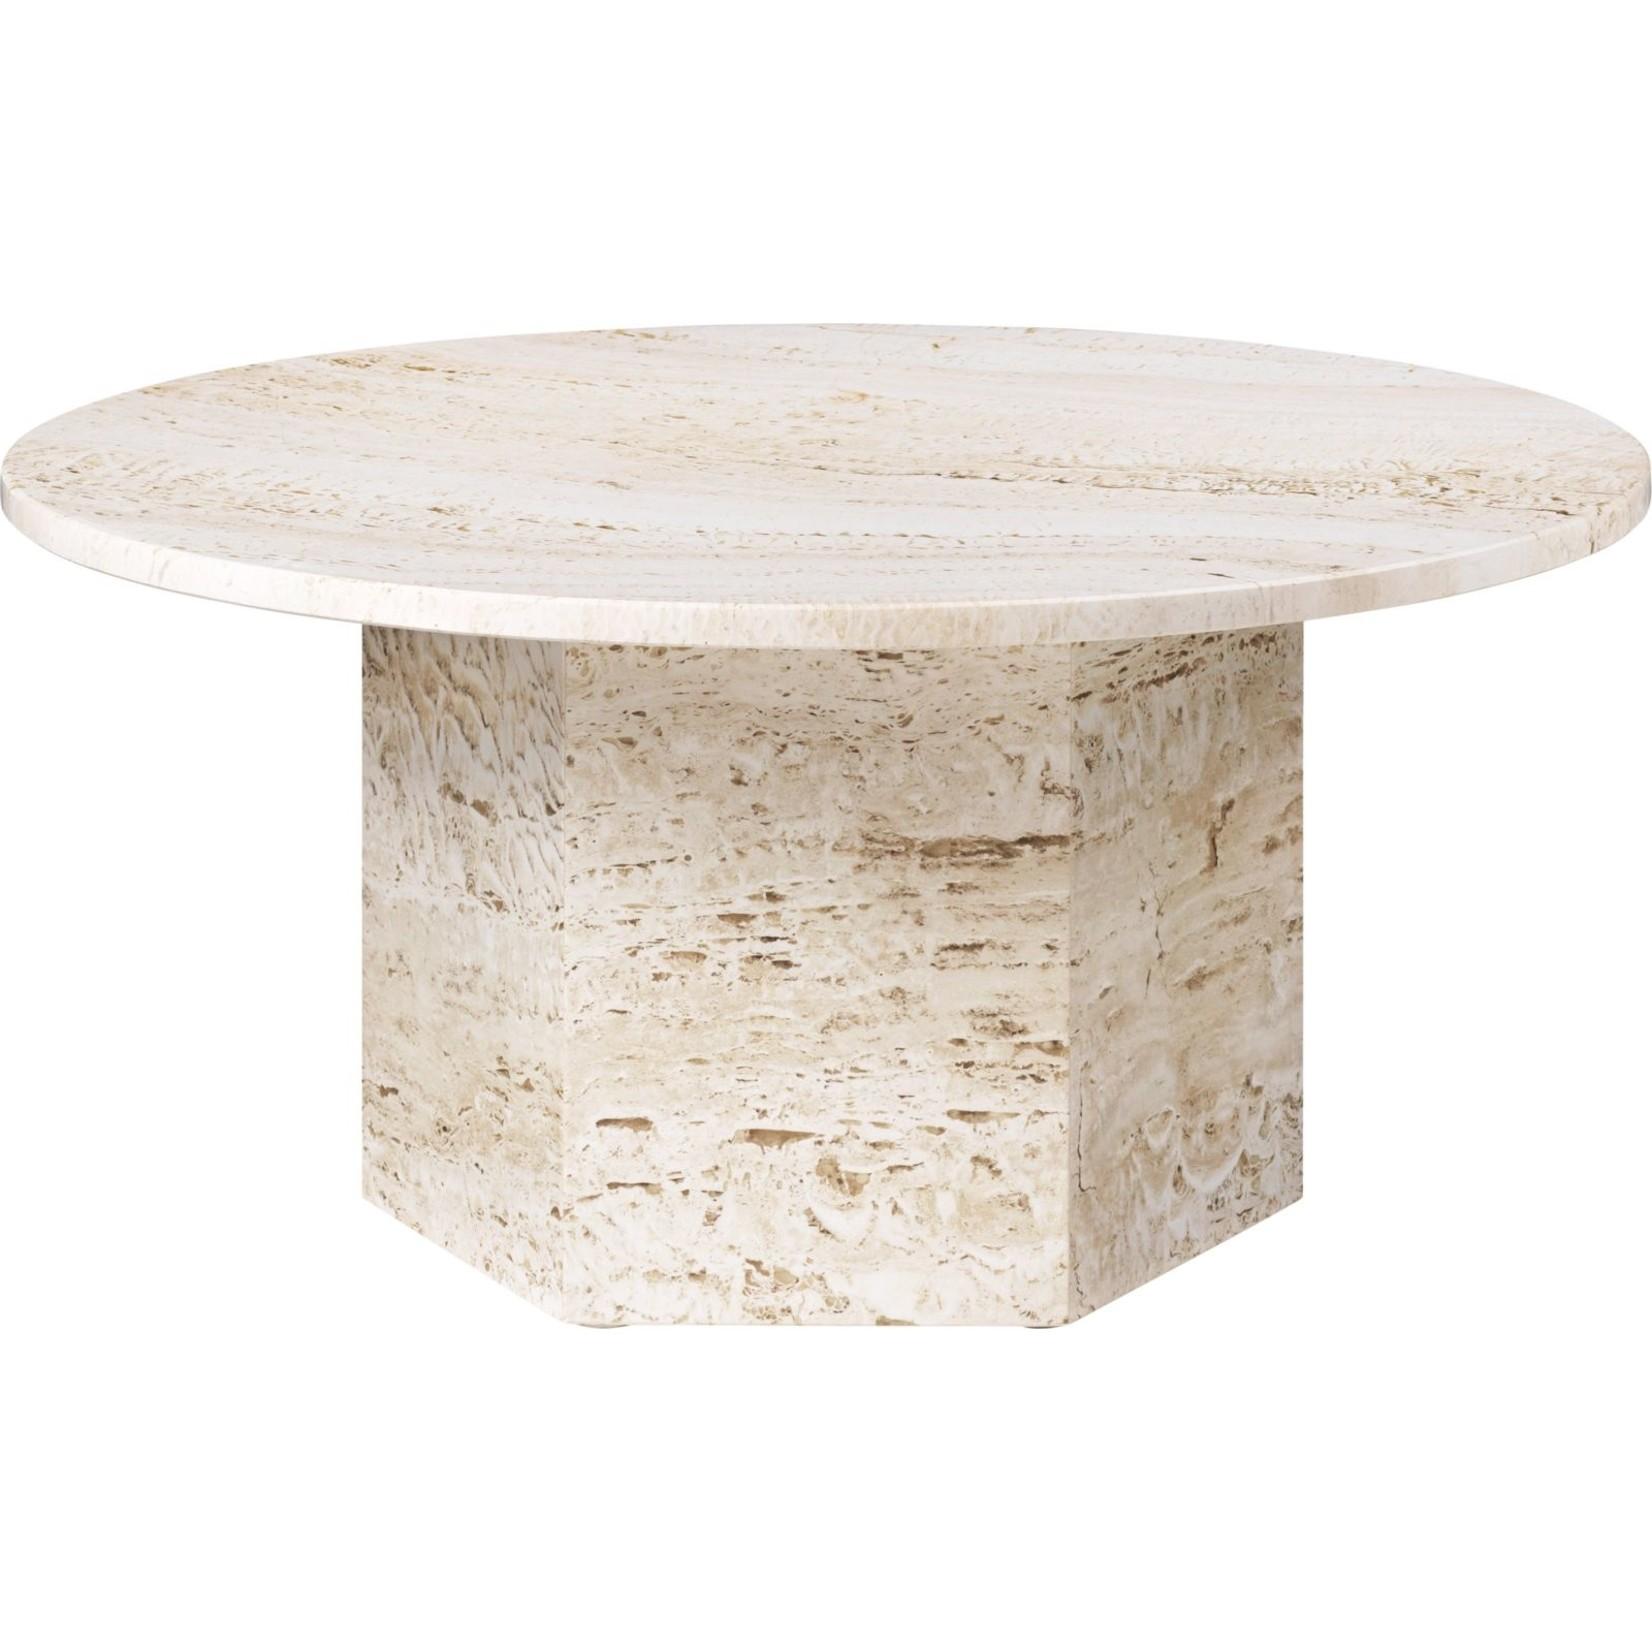 Gubi Epic Coffee Table Round Ø80 | White Travertine